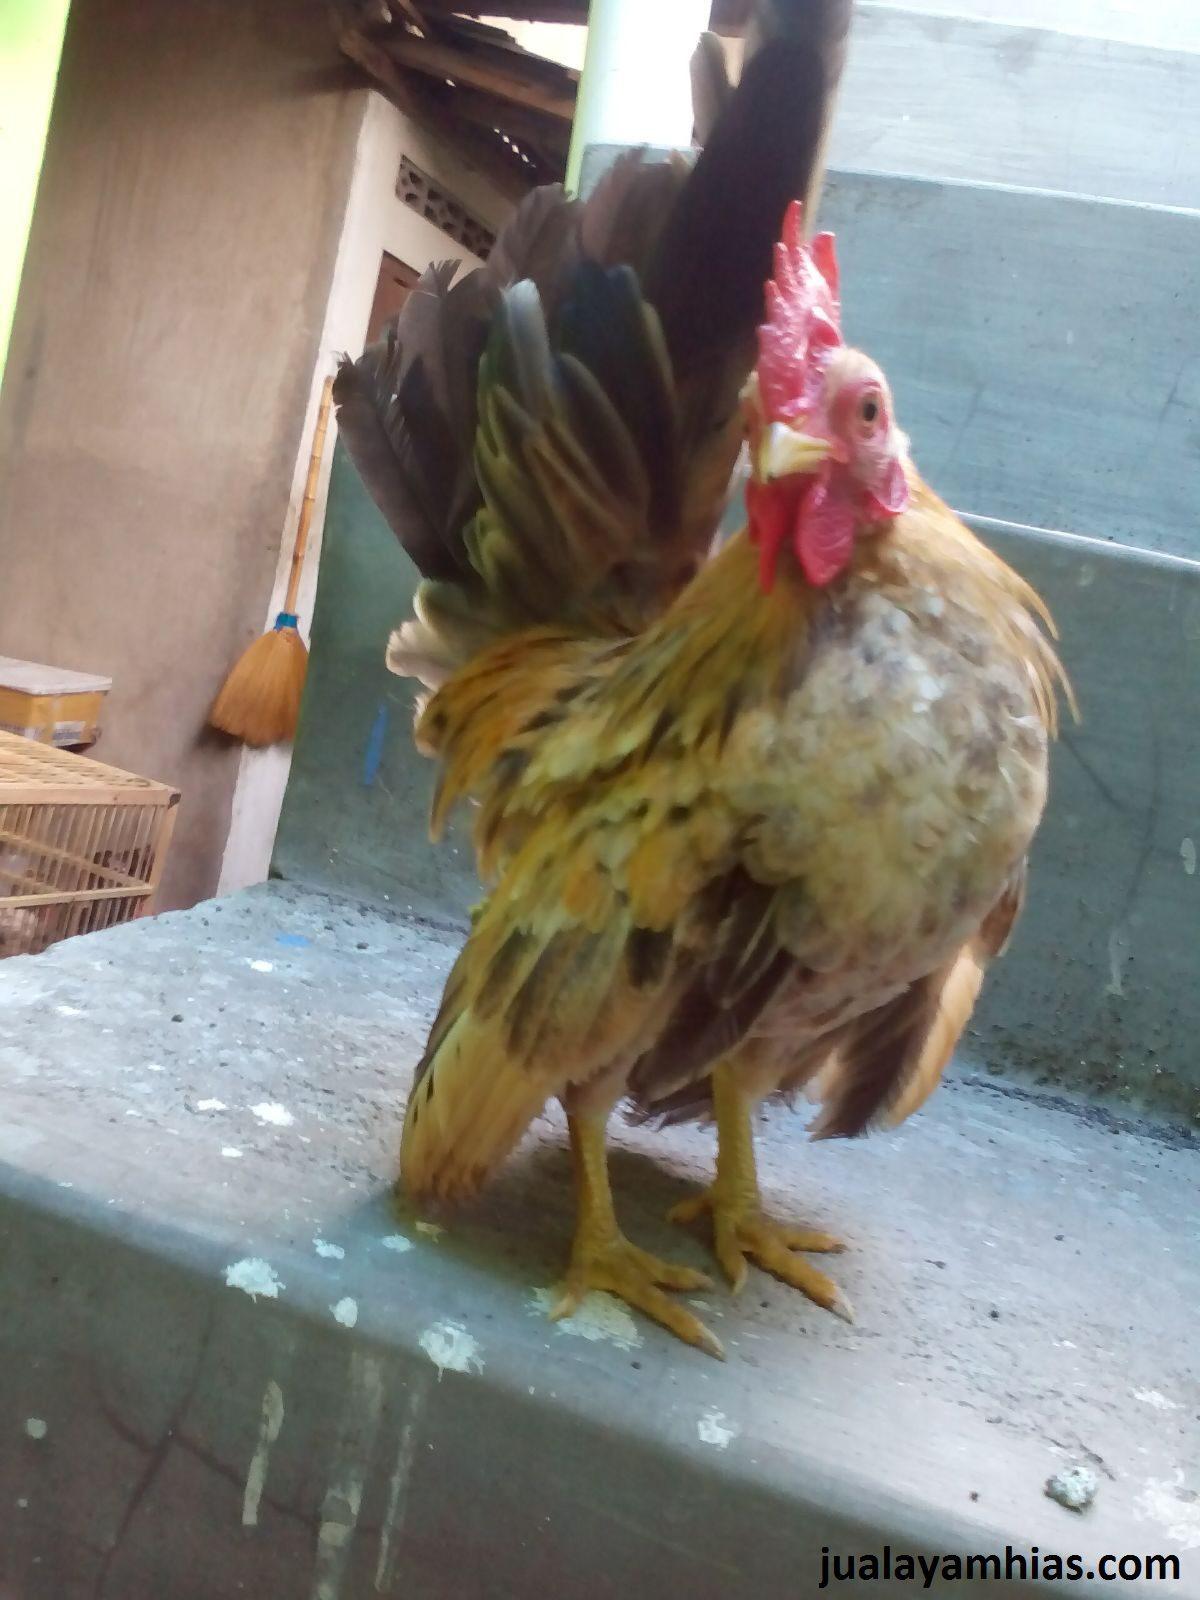 Ayam Serama Umur 5 Bulan 9 1 Ayam Bekisar Jual Ayam Hias HP : 08564 77 23 888 | BERKUALITAS DAN TERPERCAYA Ayam Bekisar Ayam Bekisar, Ayam Polan, Ayam Batik Kanada Gold dan Ayam Serama Persiapan Kirim ke Pak Rendy di Daerah Karya Jaya Palembang